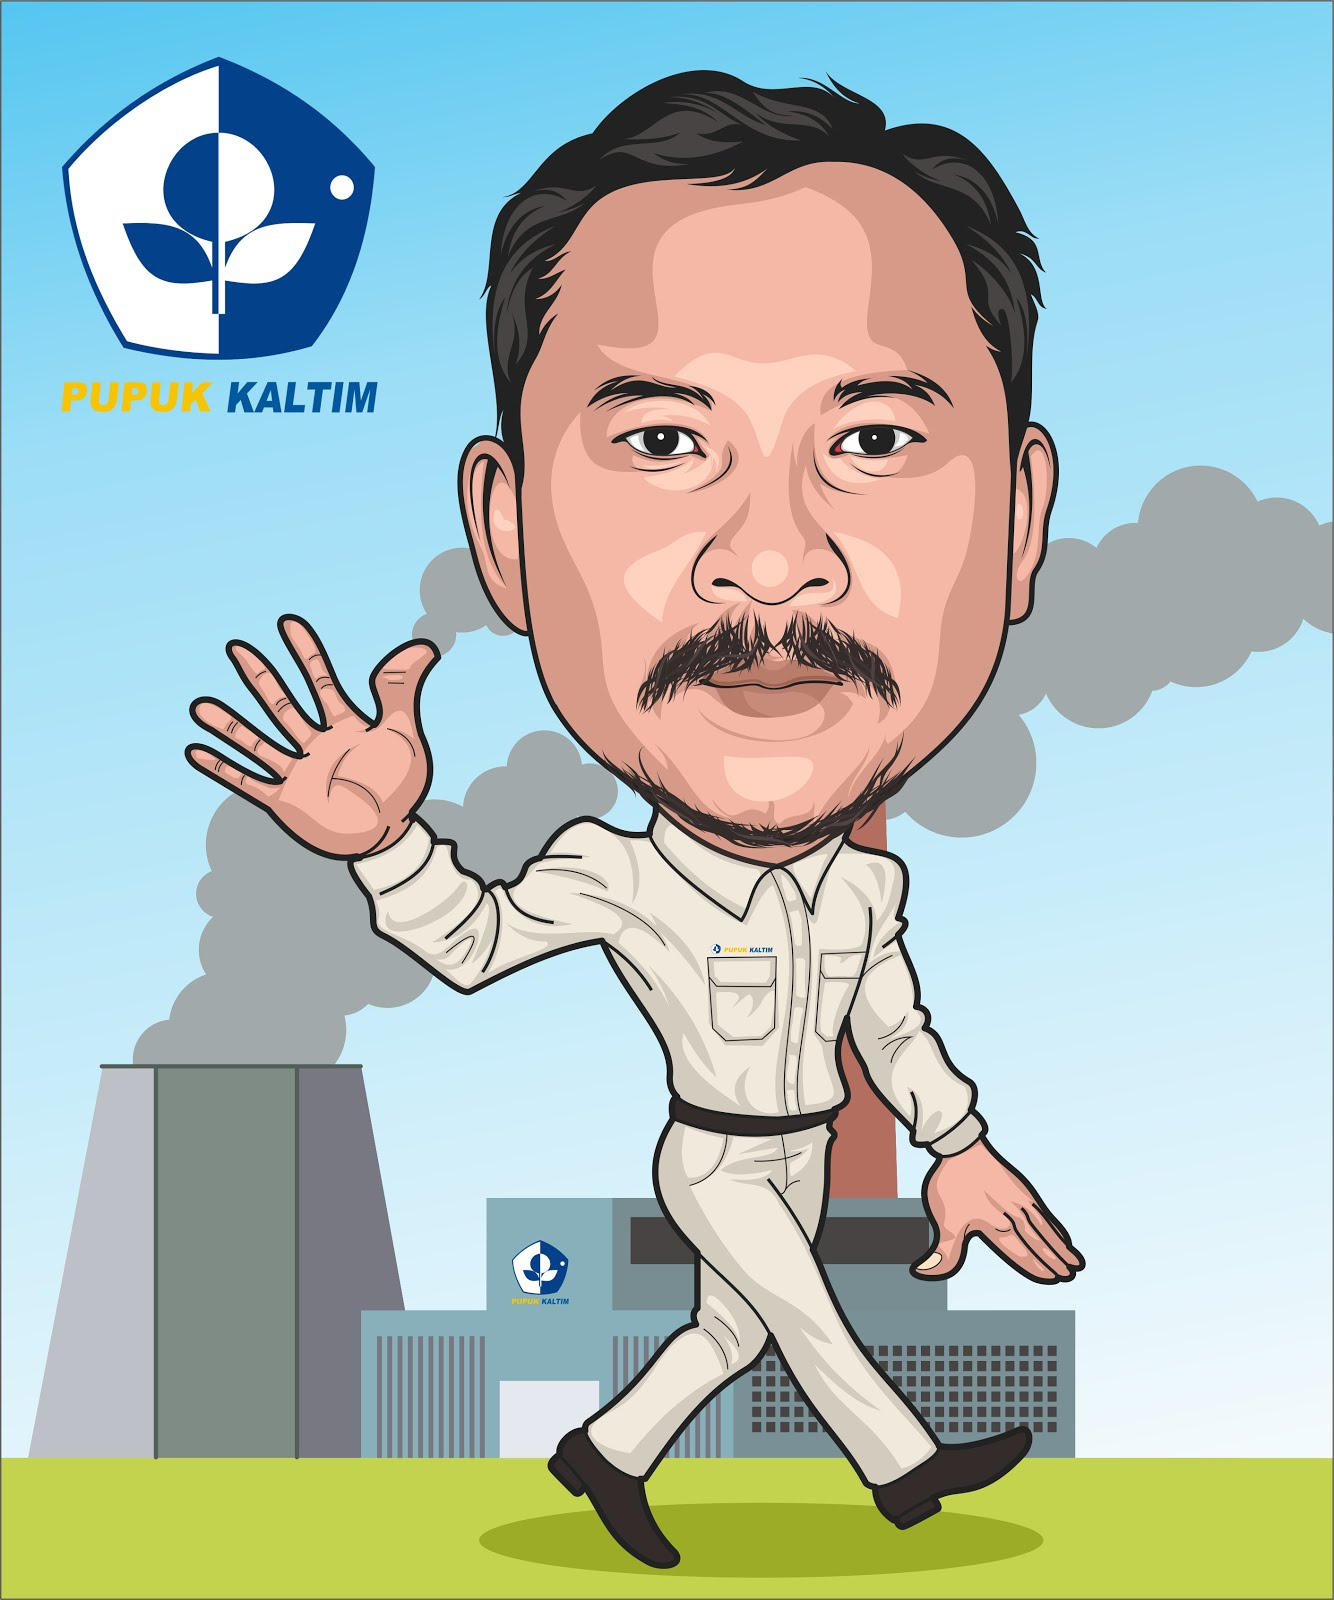 Jasa Desain Wajah: Jasa Disain Vektor Kartun, Karikatur, Siluet, LineArt